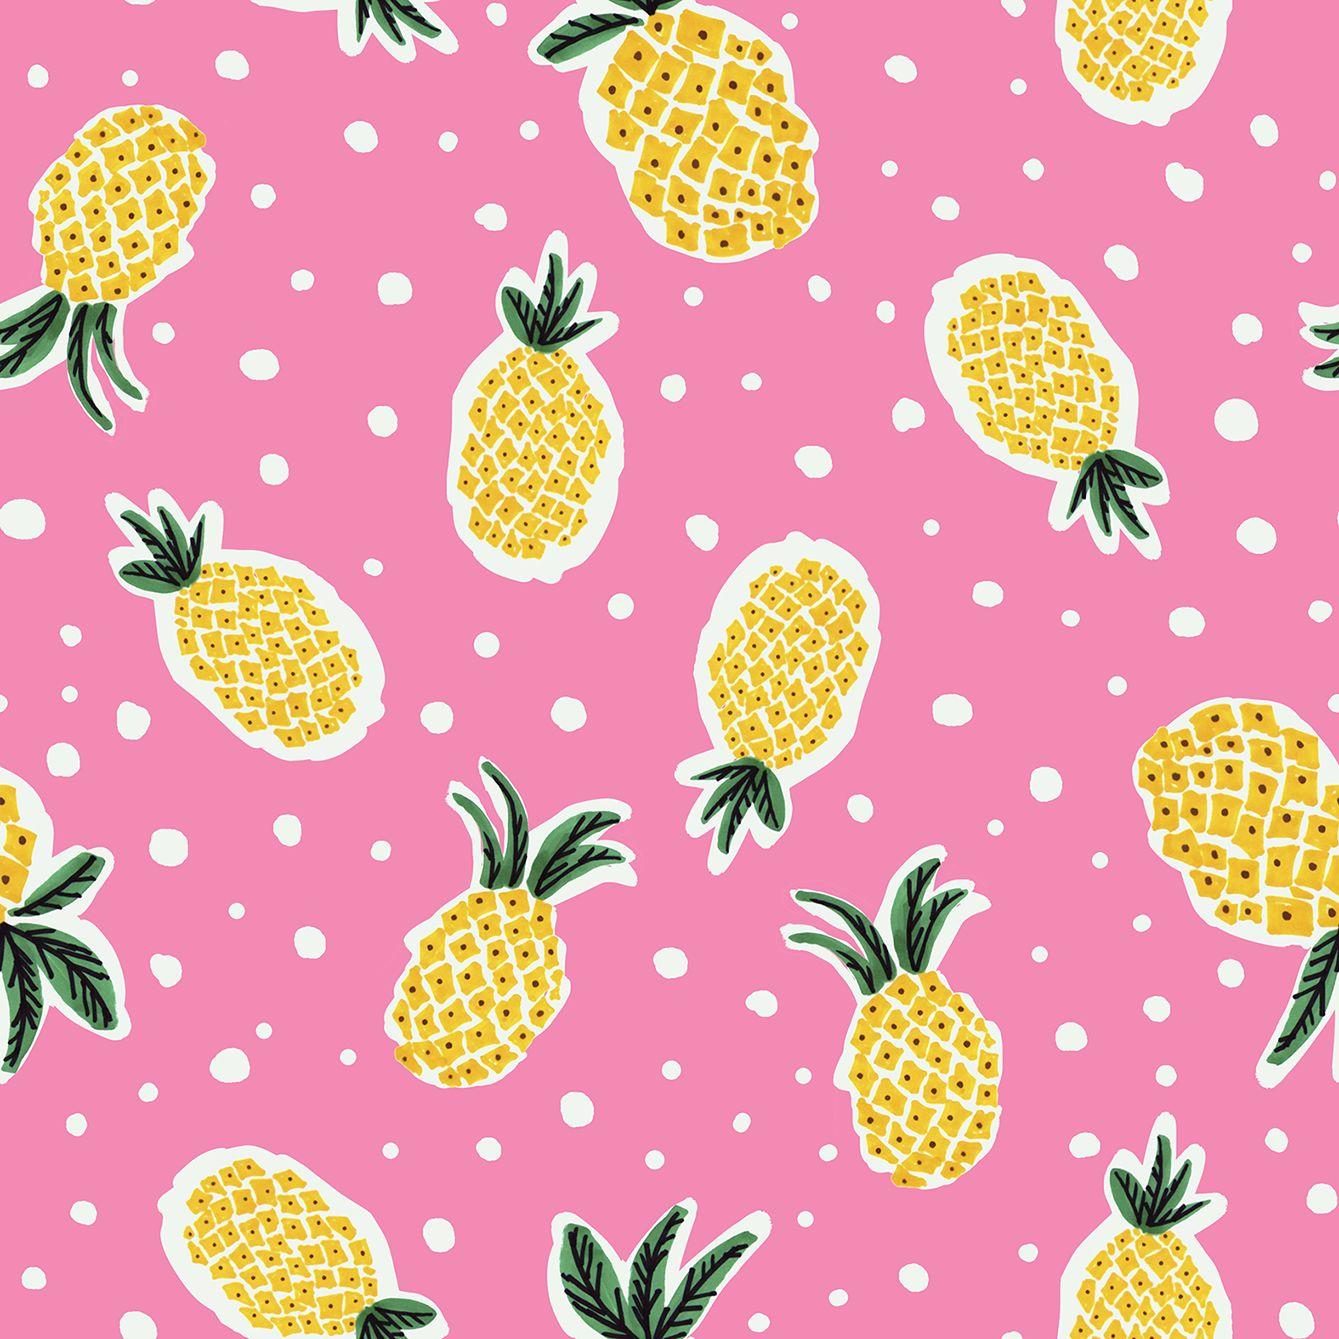 c4110658546a0 Pineapple print.   Prints   Graphics   Pinterest   Prints ...